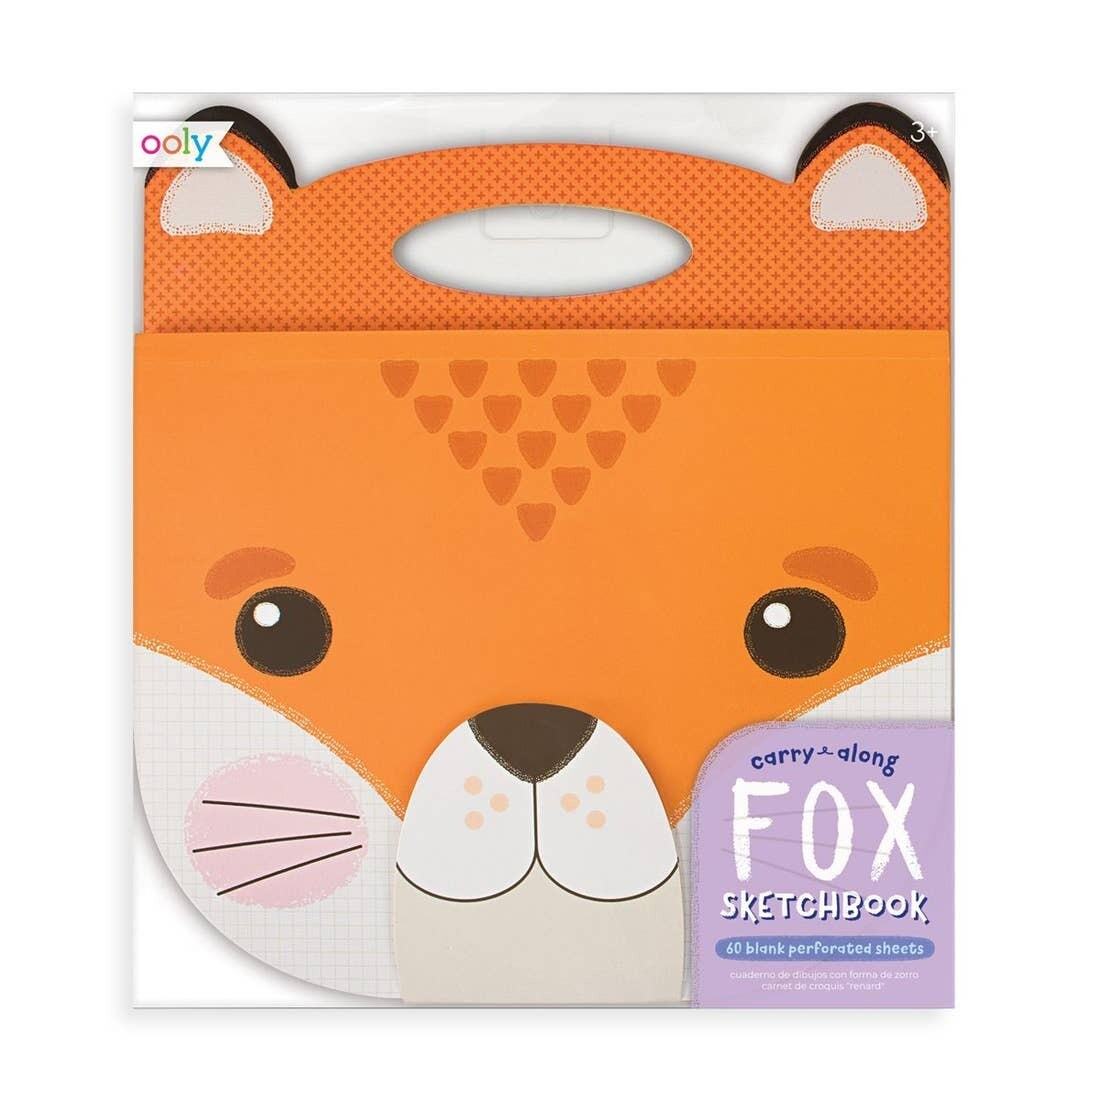 Carry Along Fox Sketchbook